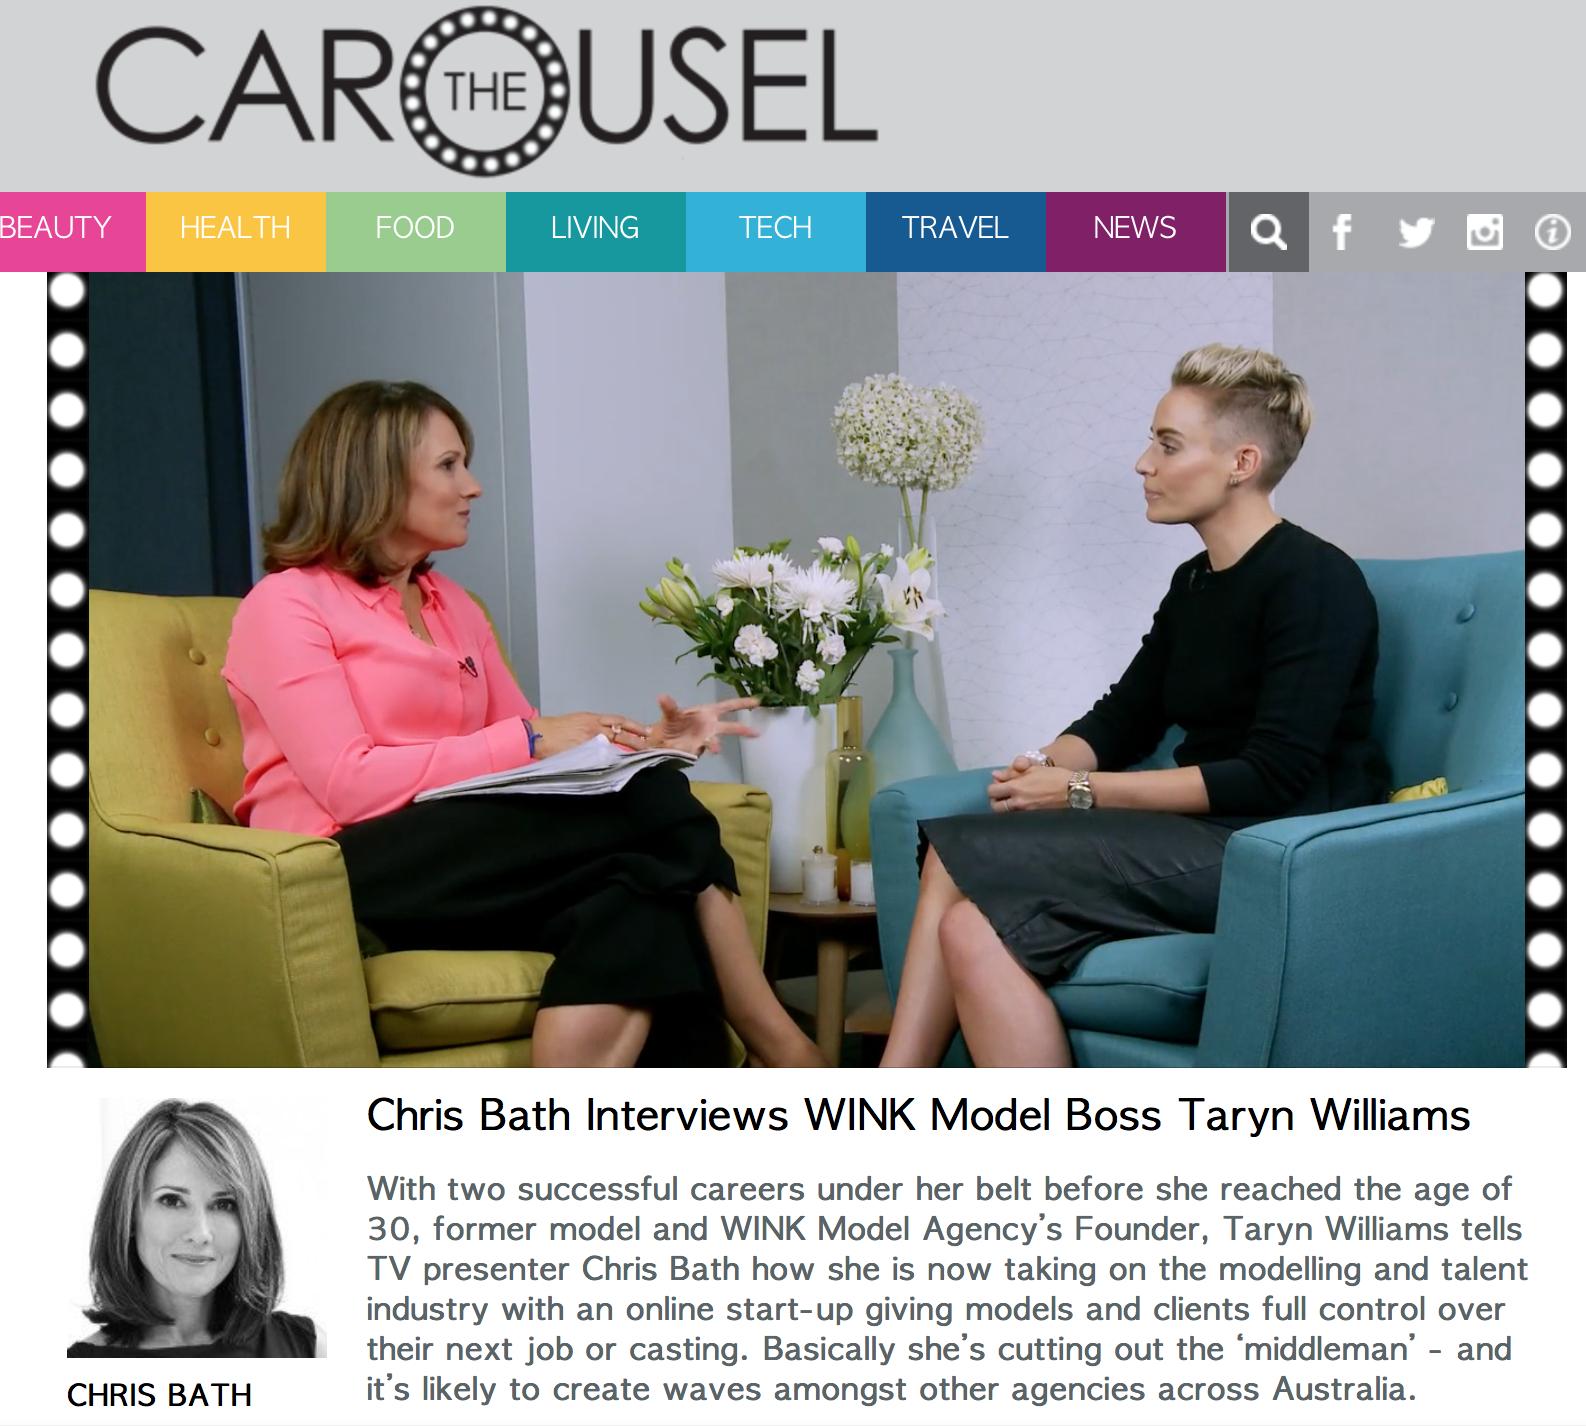 http://thecarousel.com/living/careers/chris-bath-interviews-wink-model-boss-taryn-williams/